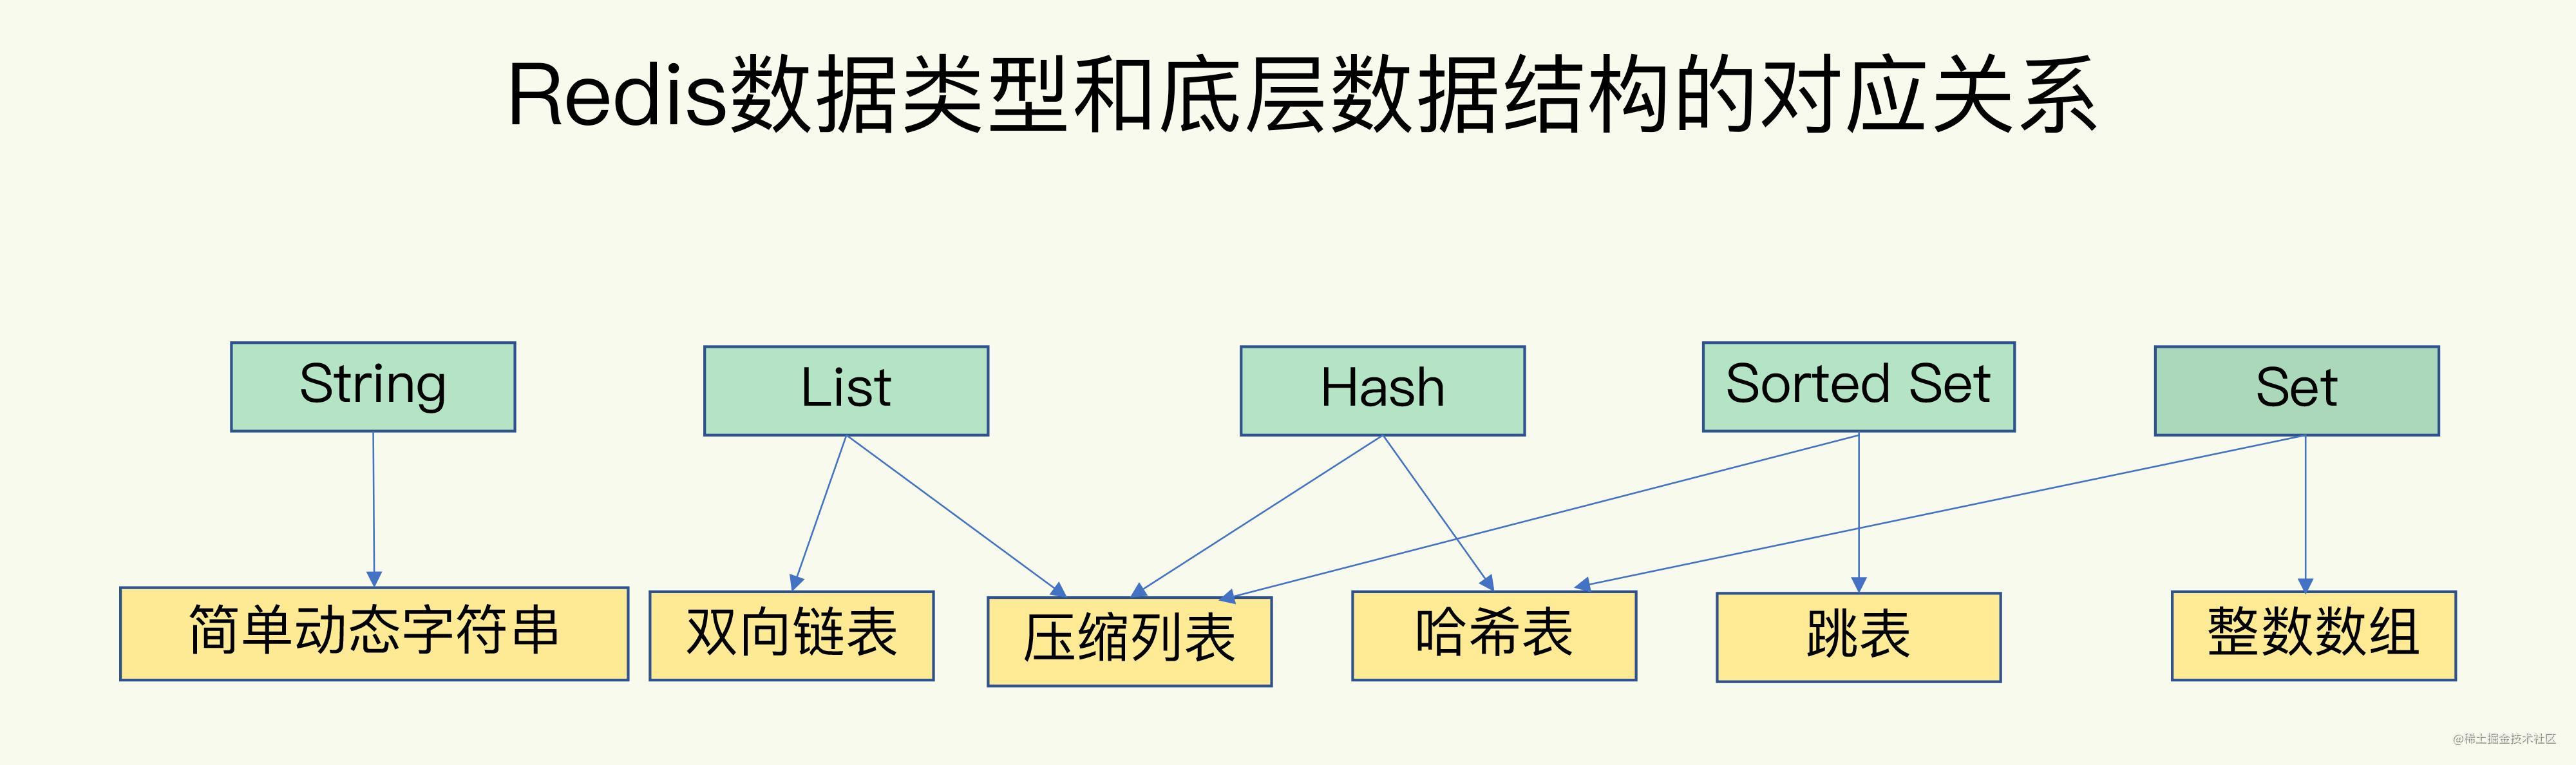 Redis数据结构之间的联系.jpg